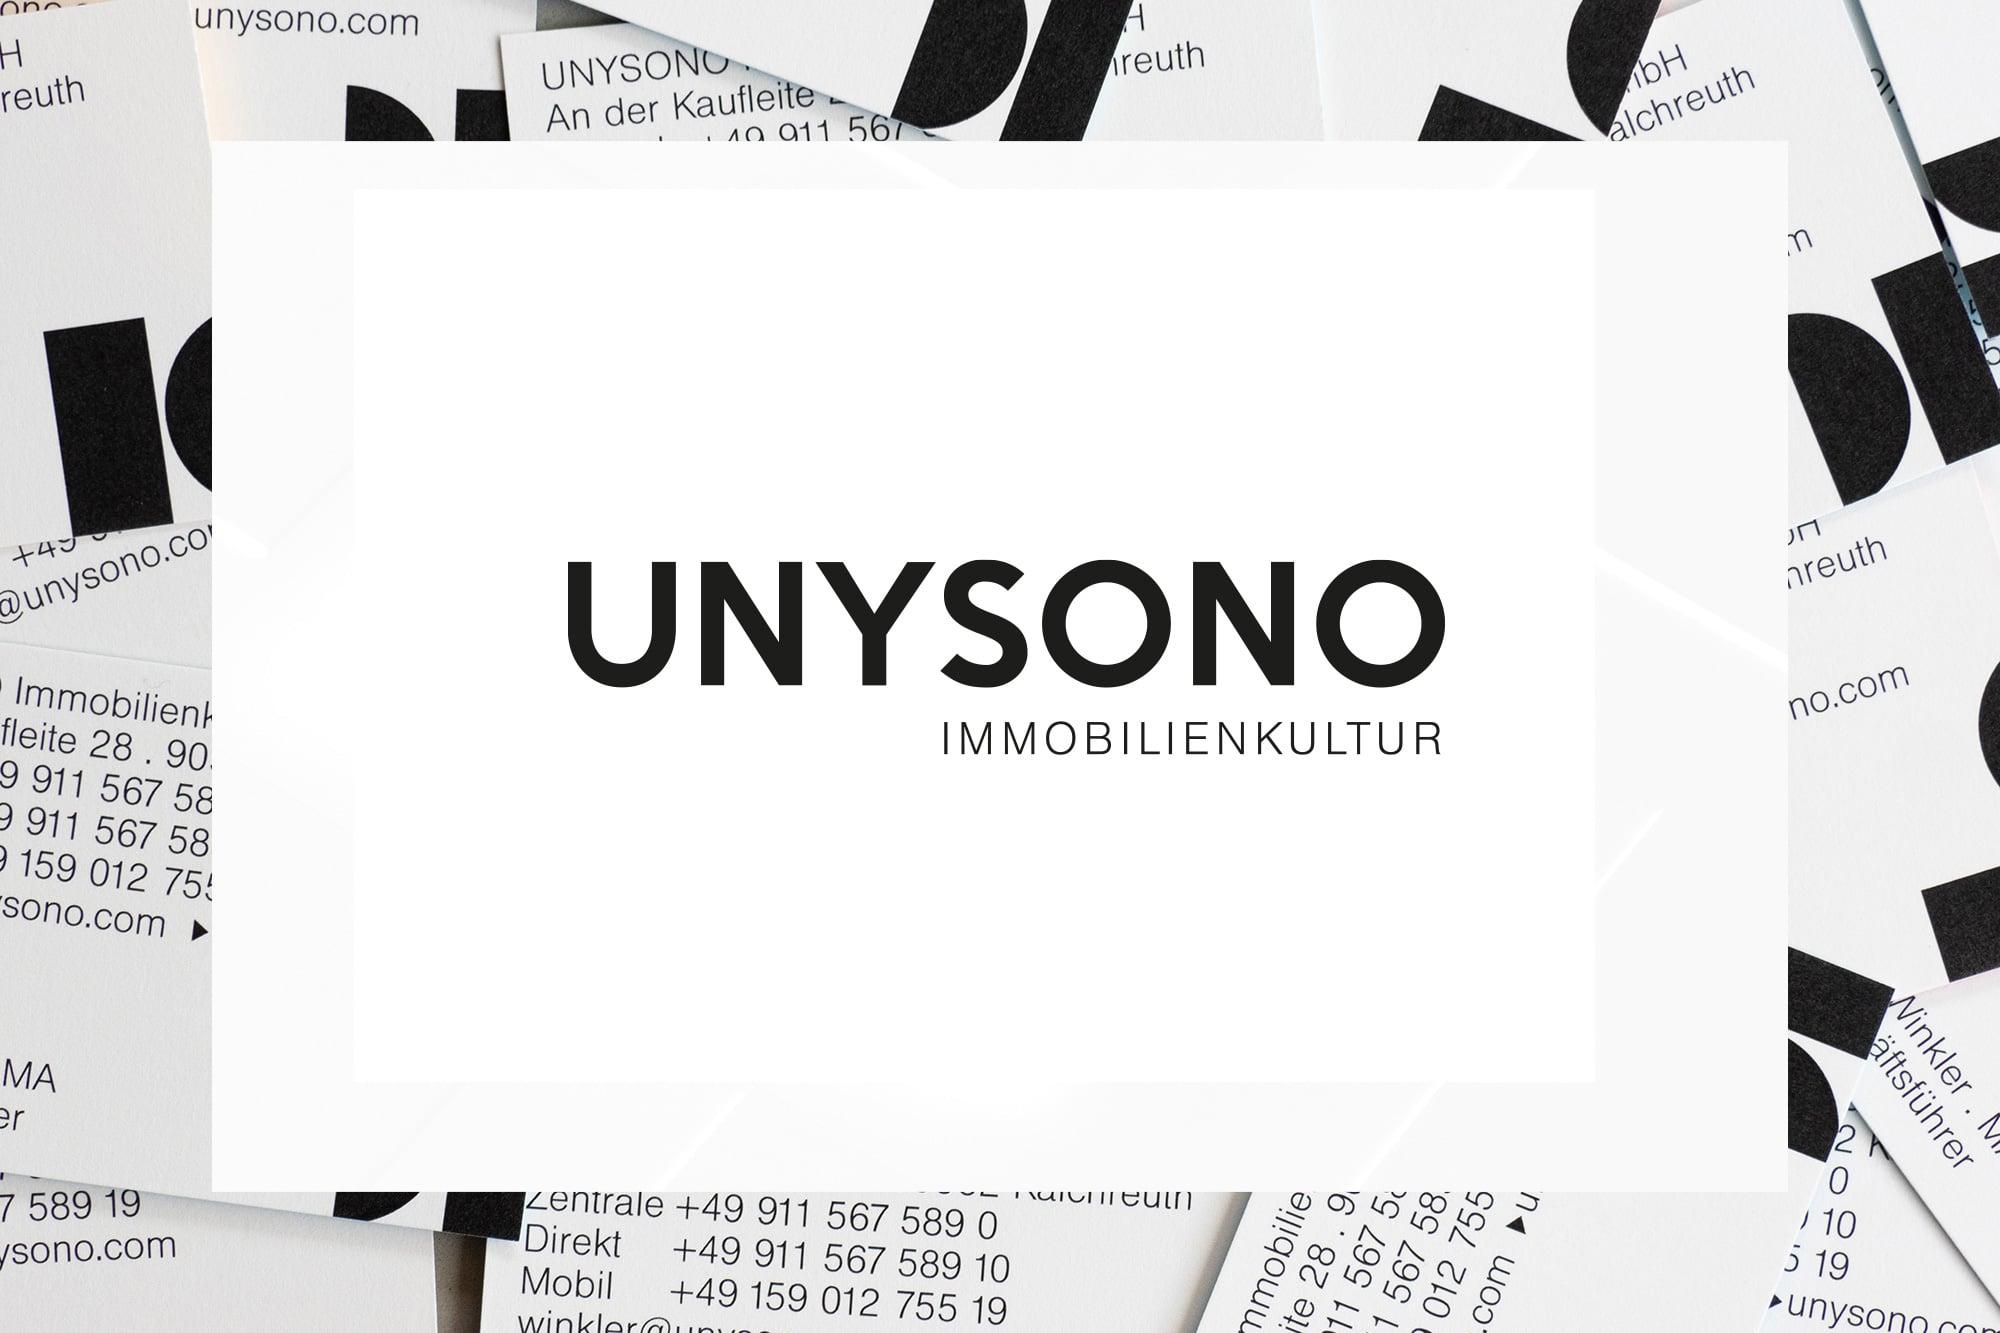 planx-UNYSONO-CorporateDesign-Logo-MOCK